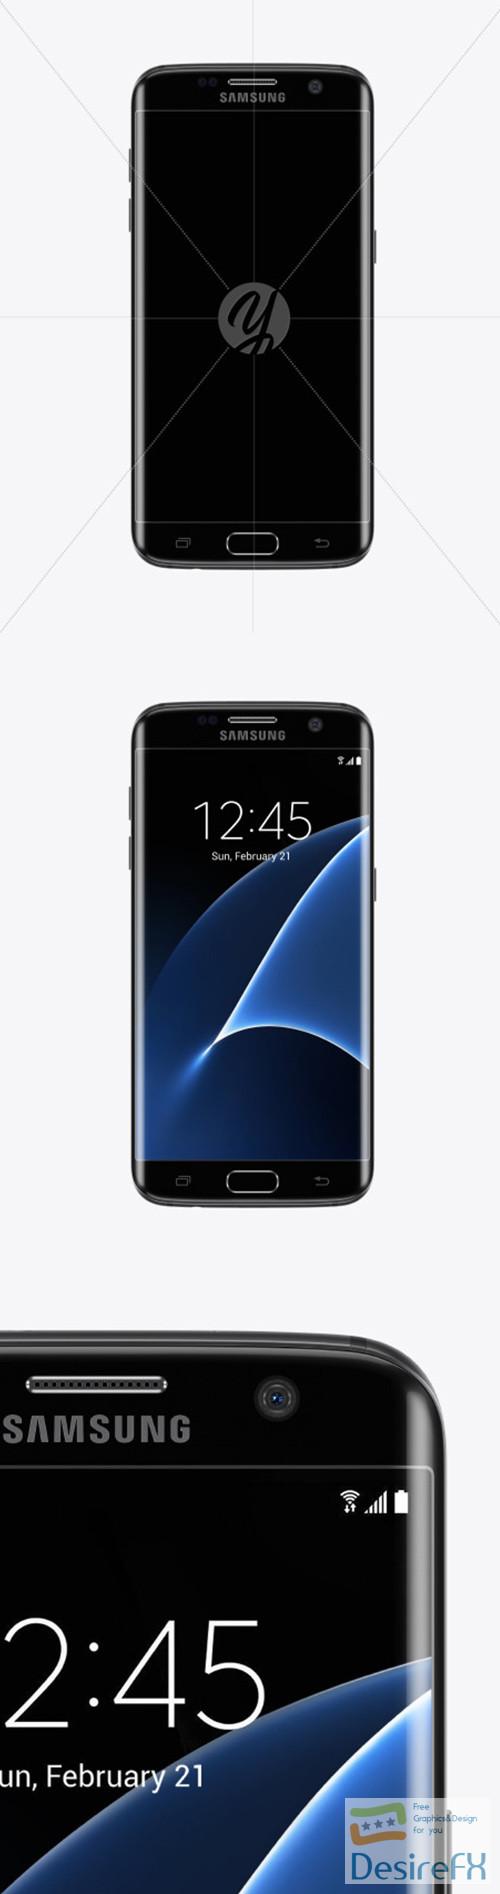 mock-up - Black Onyx Samsung Galaxy S7 Phone Mockup 52110 TIF